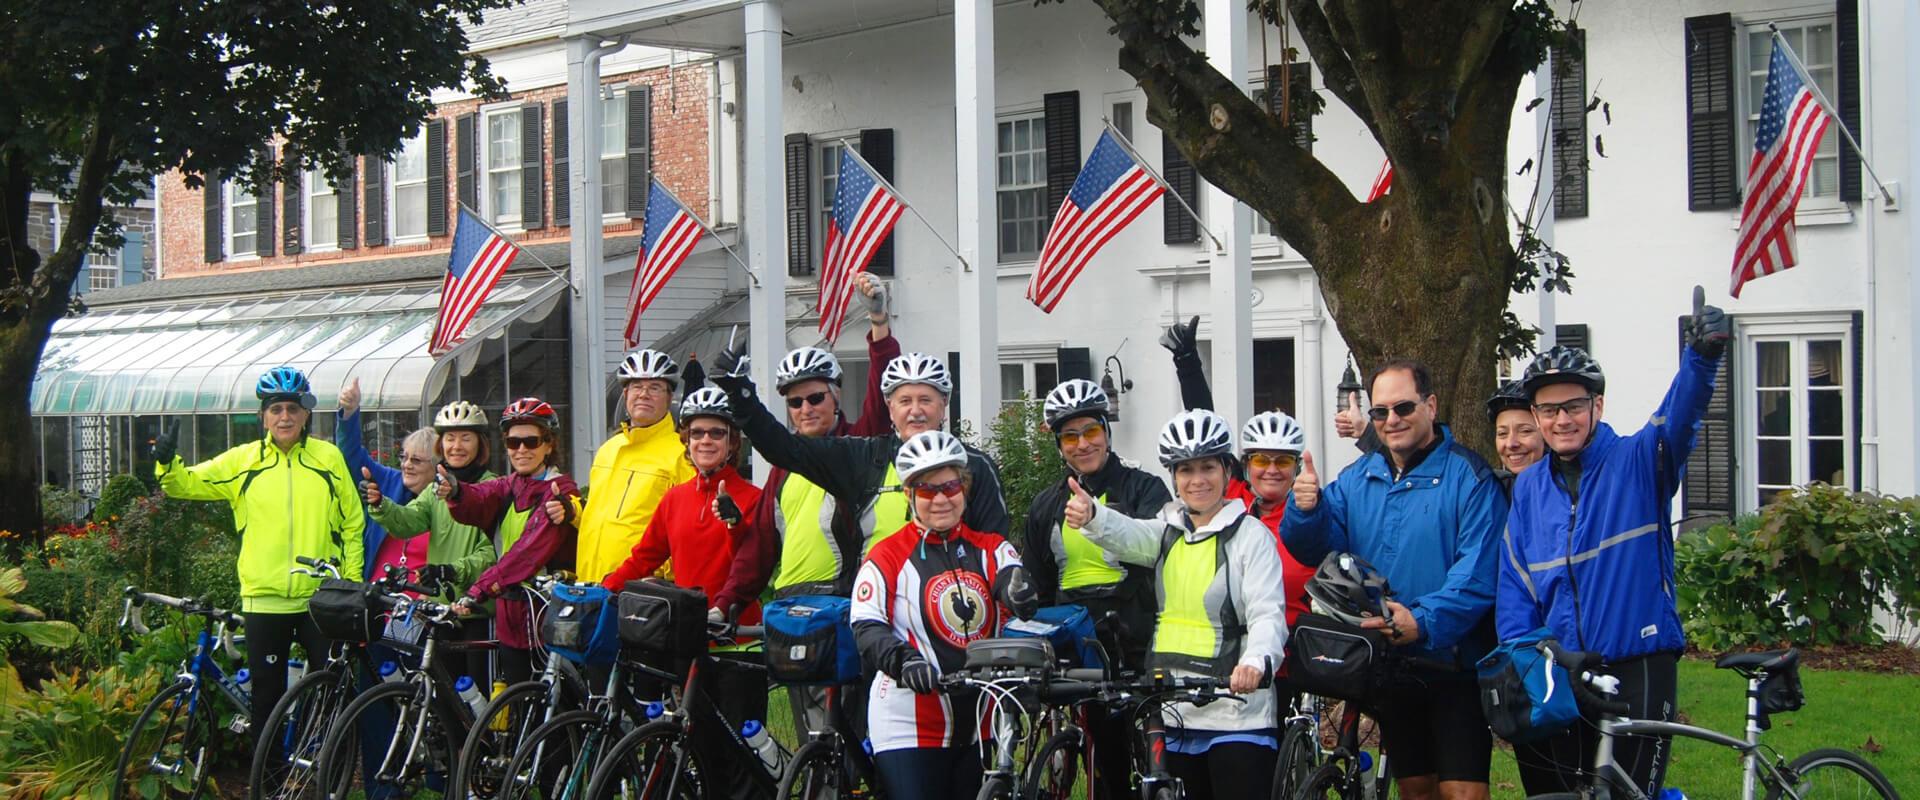 Bike Tour in New York's Hudson Valley | Wine Bike Tour